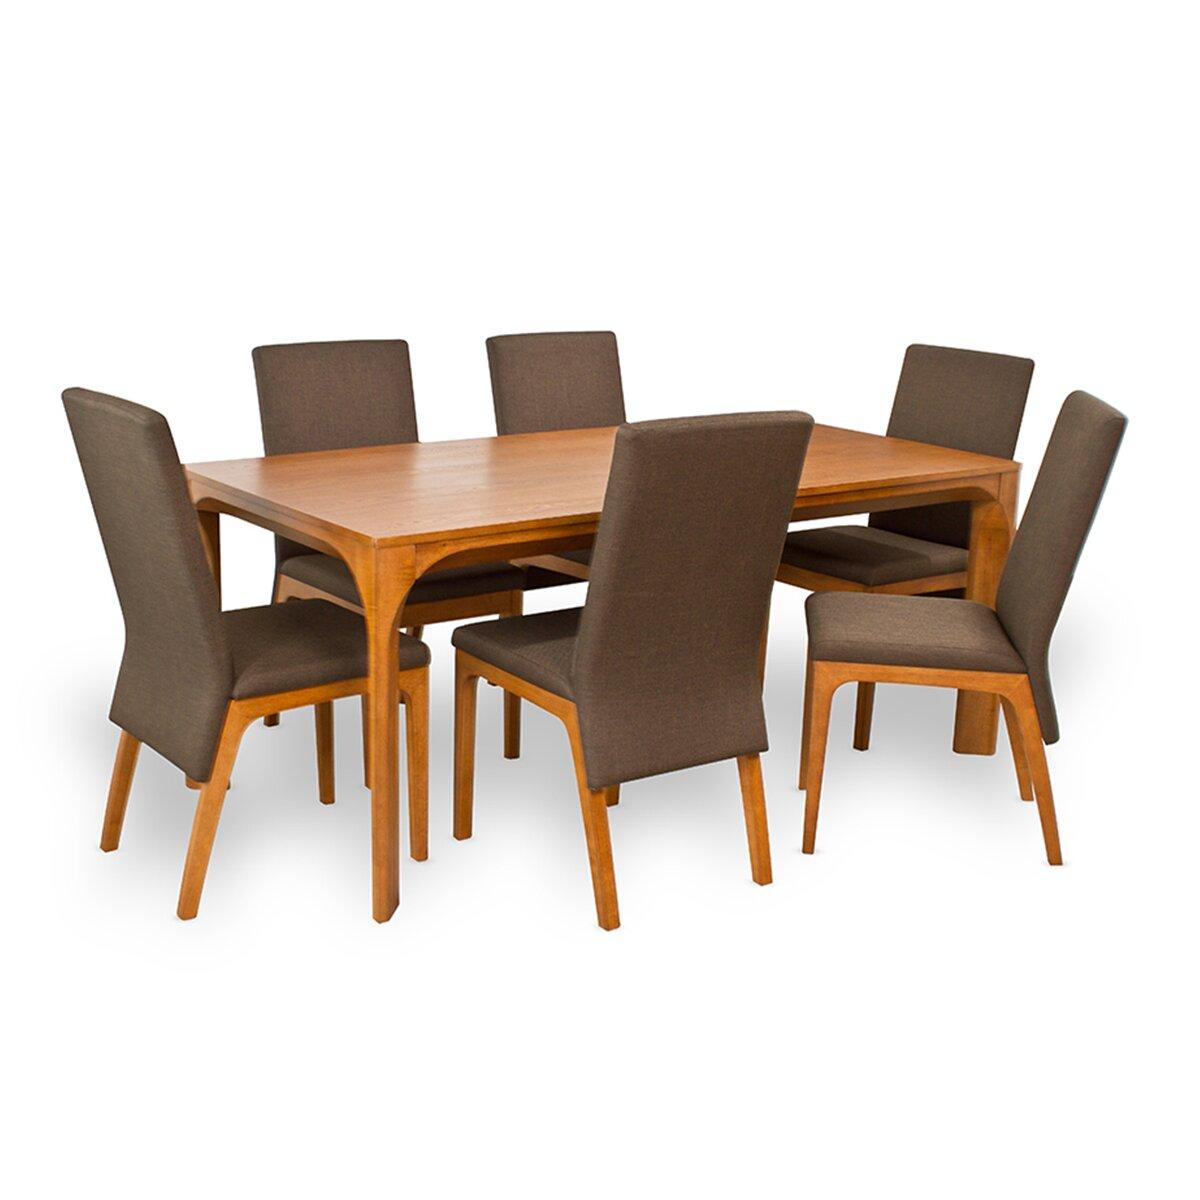 Furniture Imports: Lenox 7 Piece Dining Set